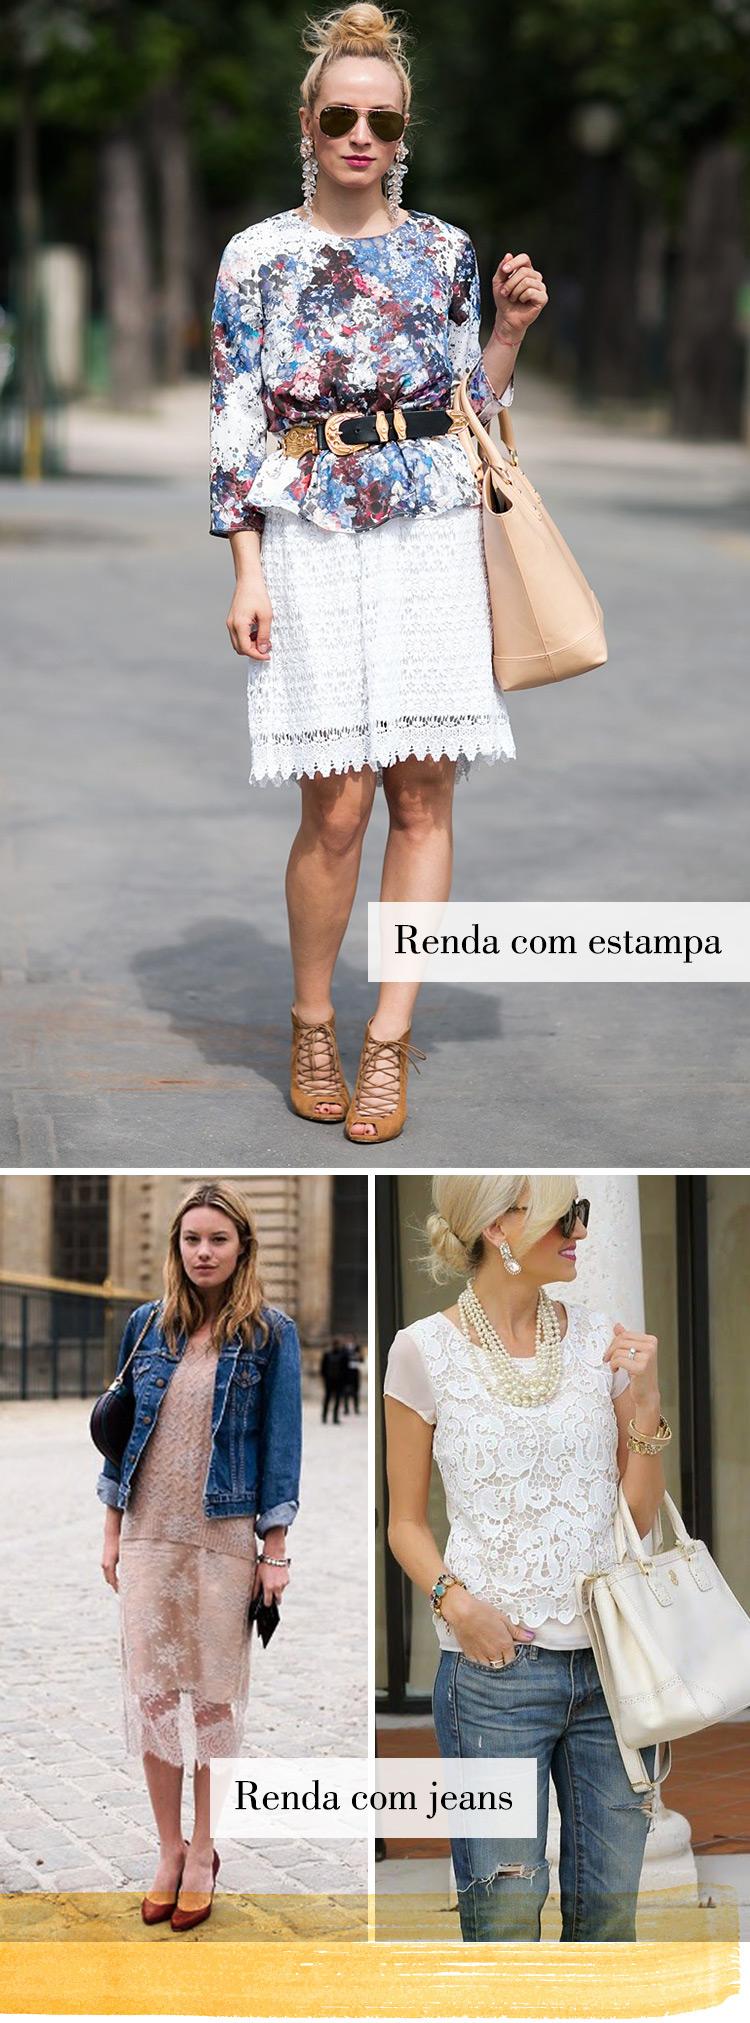 Post_rendas_02.jpg